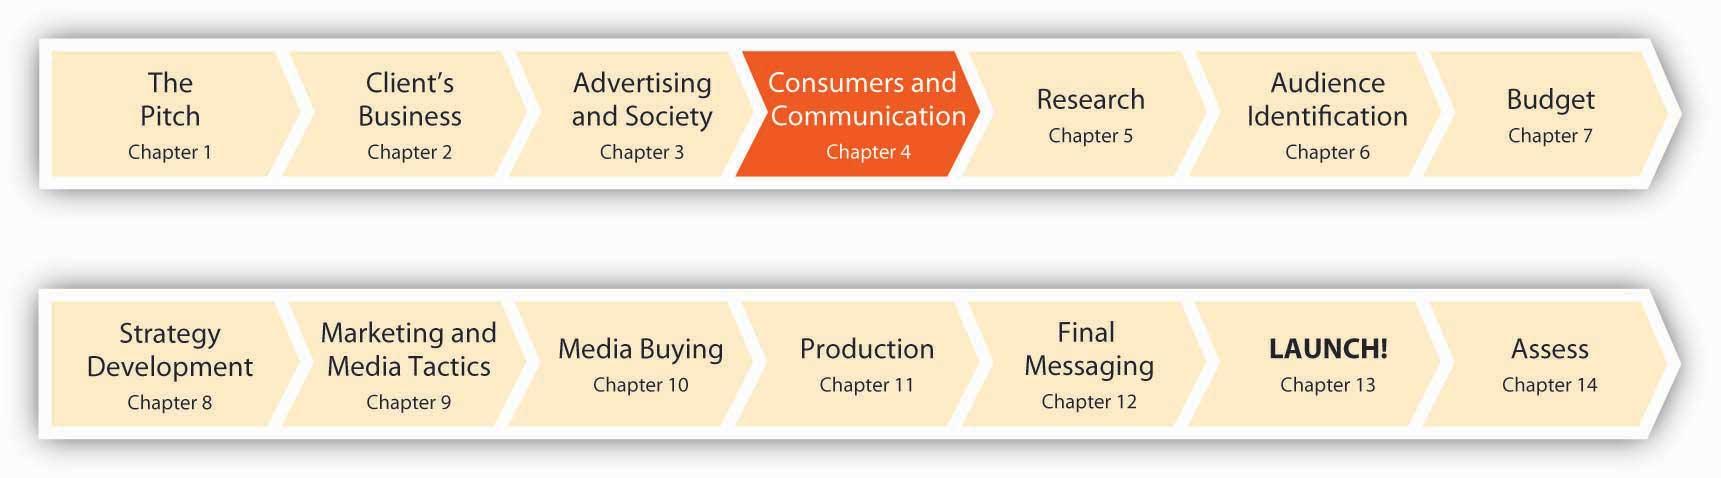 Communication Process Images